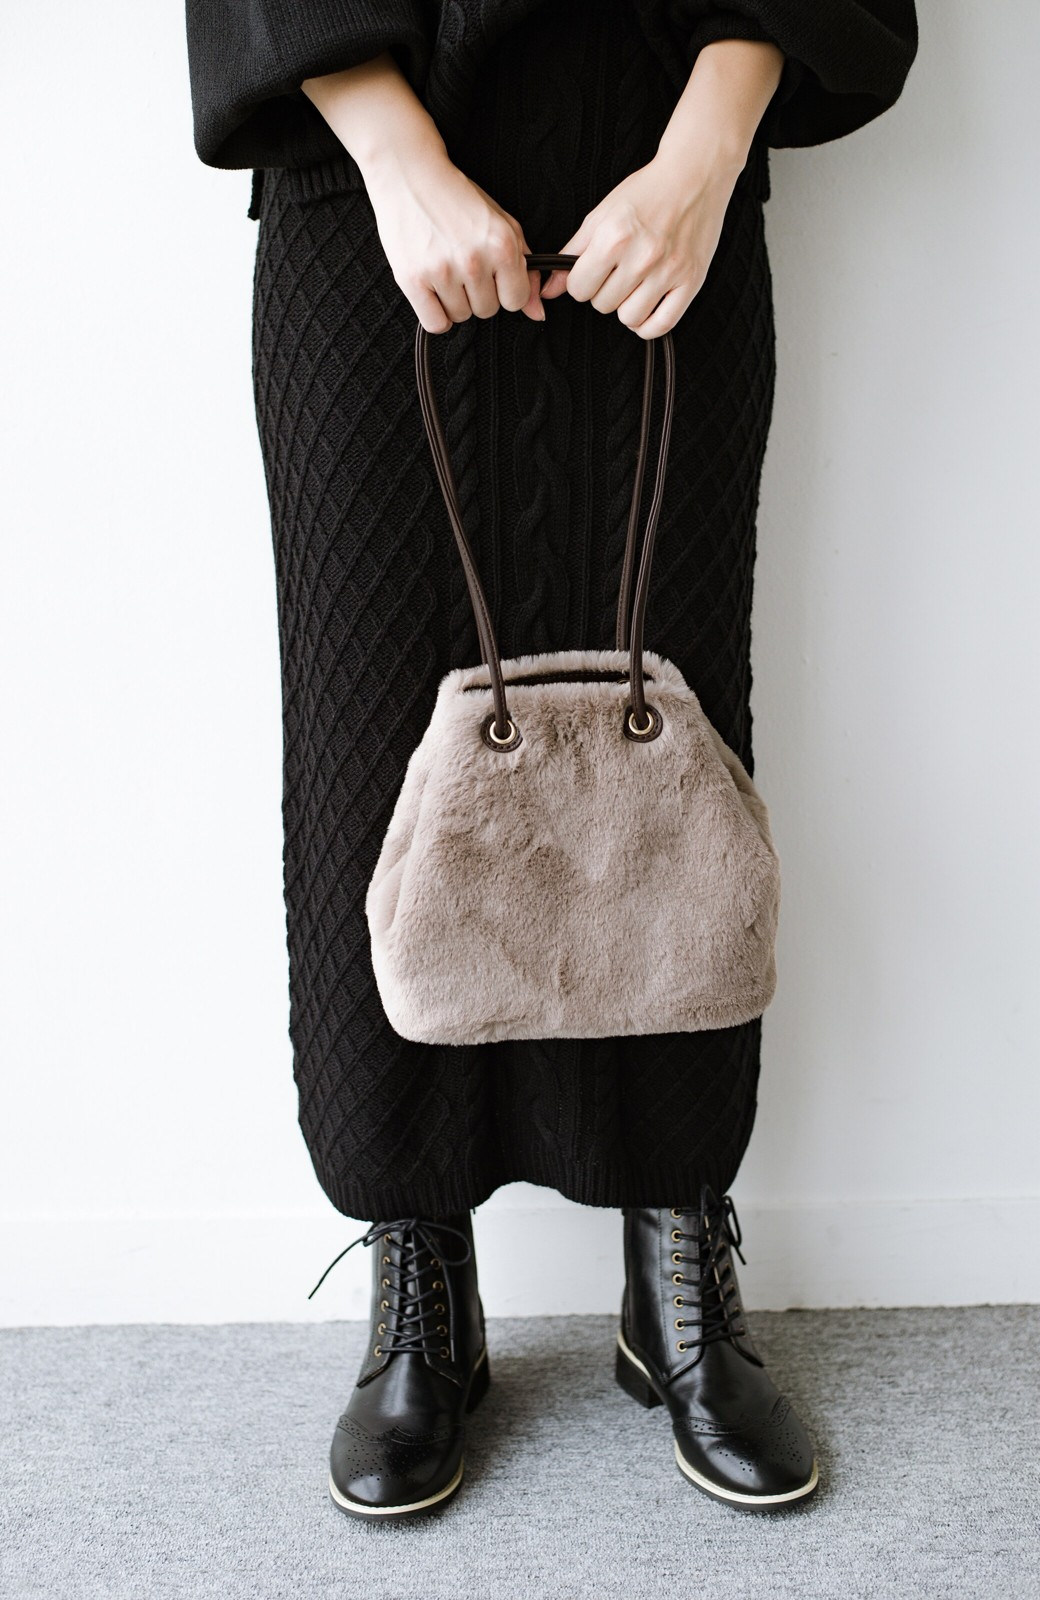 haco! さっと持って気分が上がる ふわっとかわいいエコファー巾着バッグ <グレイッシュベージュ>の商品写真4